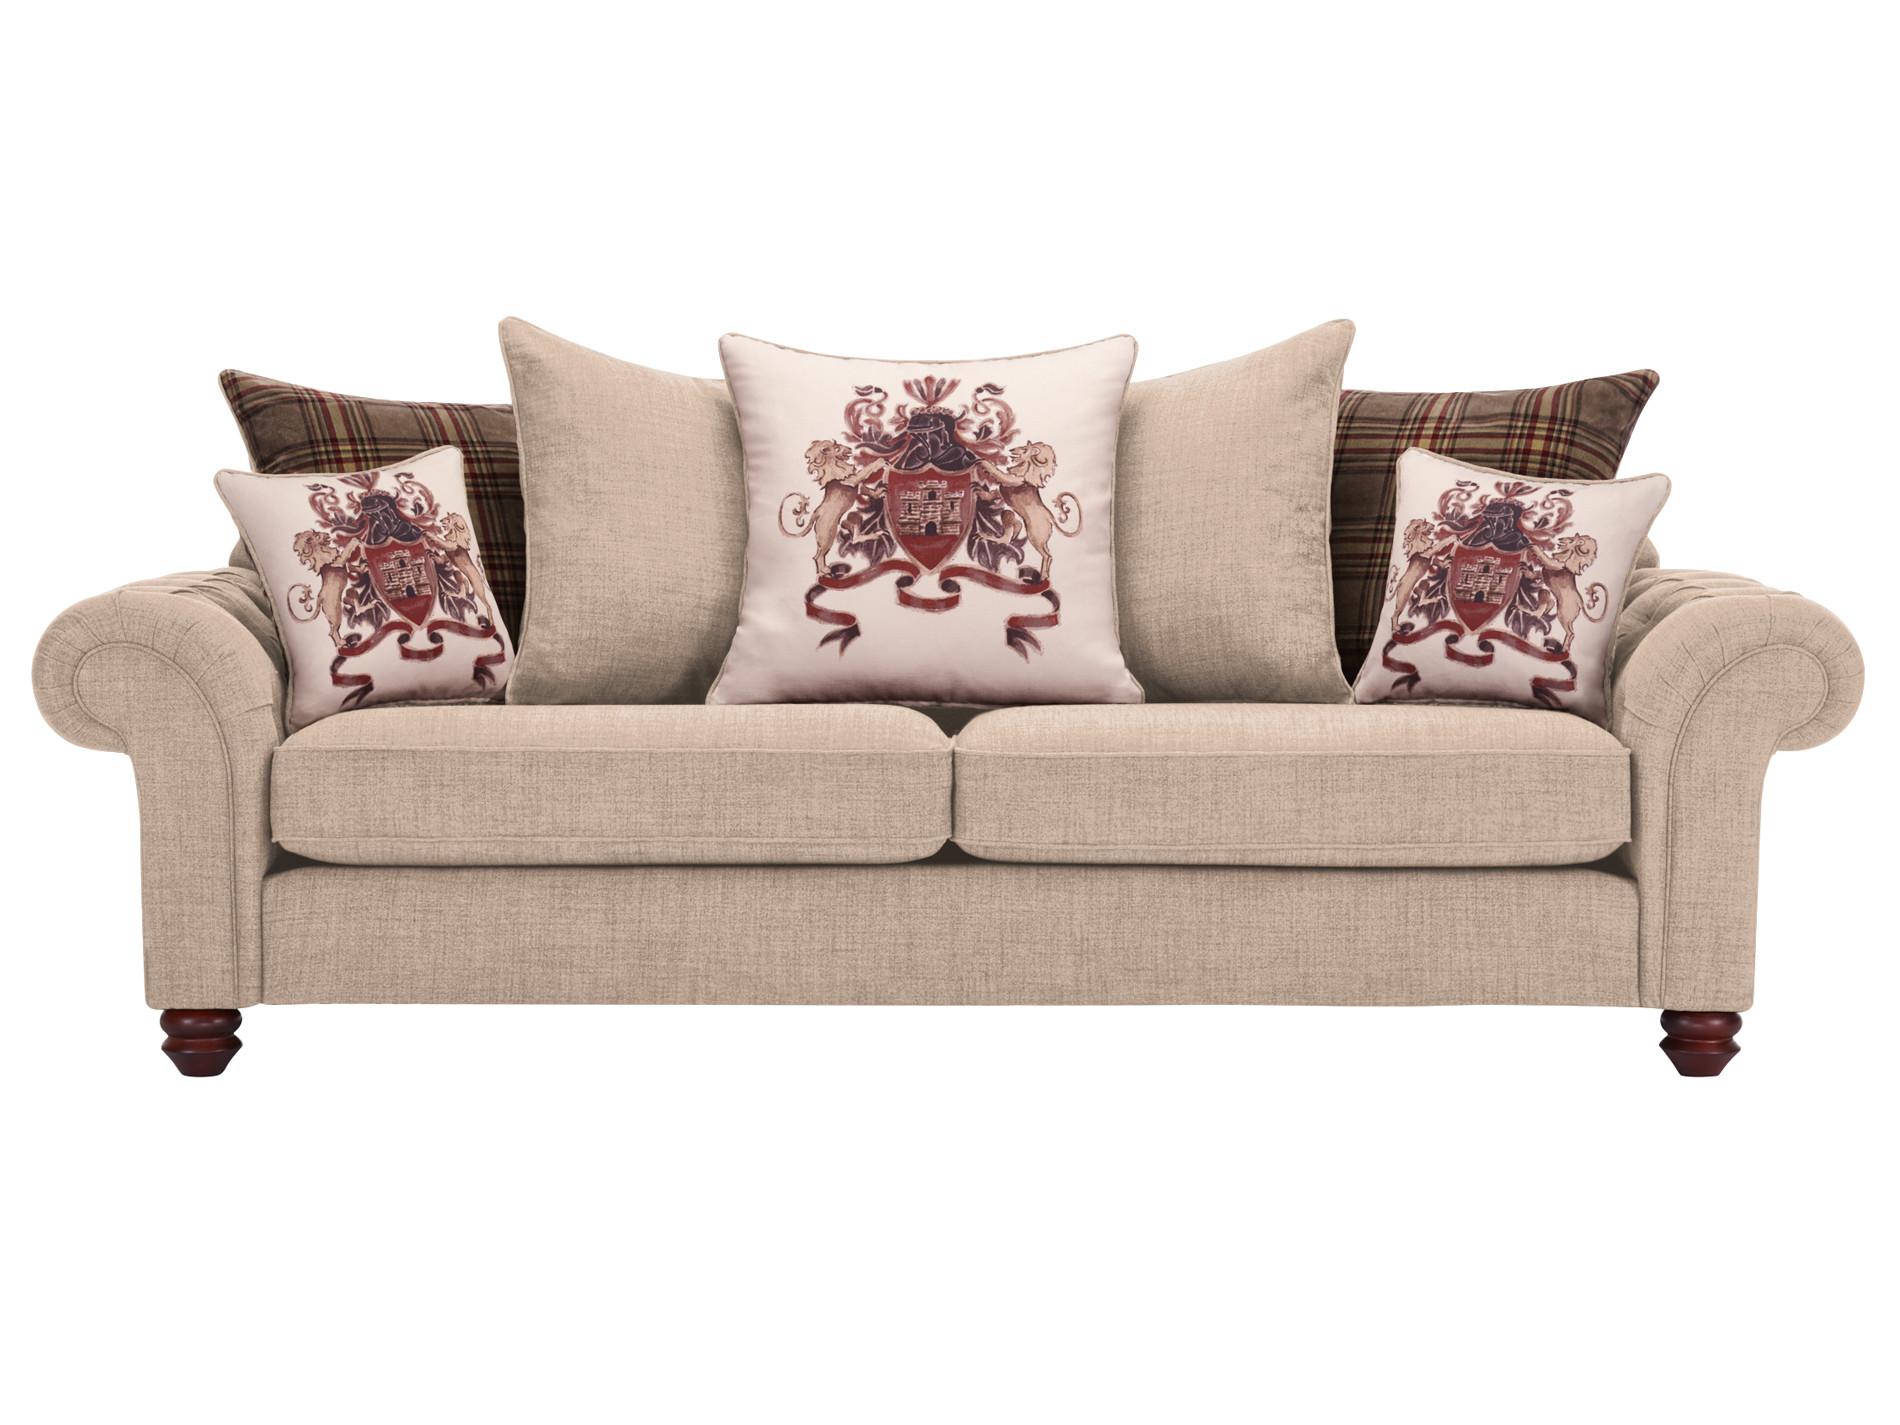 sandringham 4 seater pillow back sofa in beige with brown scatters. Black Bedroom Furniture Sets. Home Design Ideas